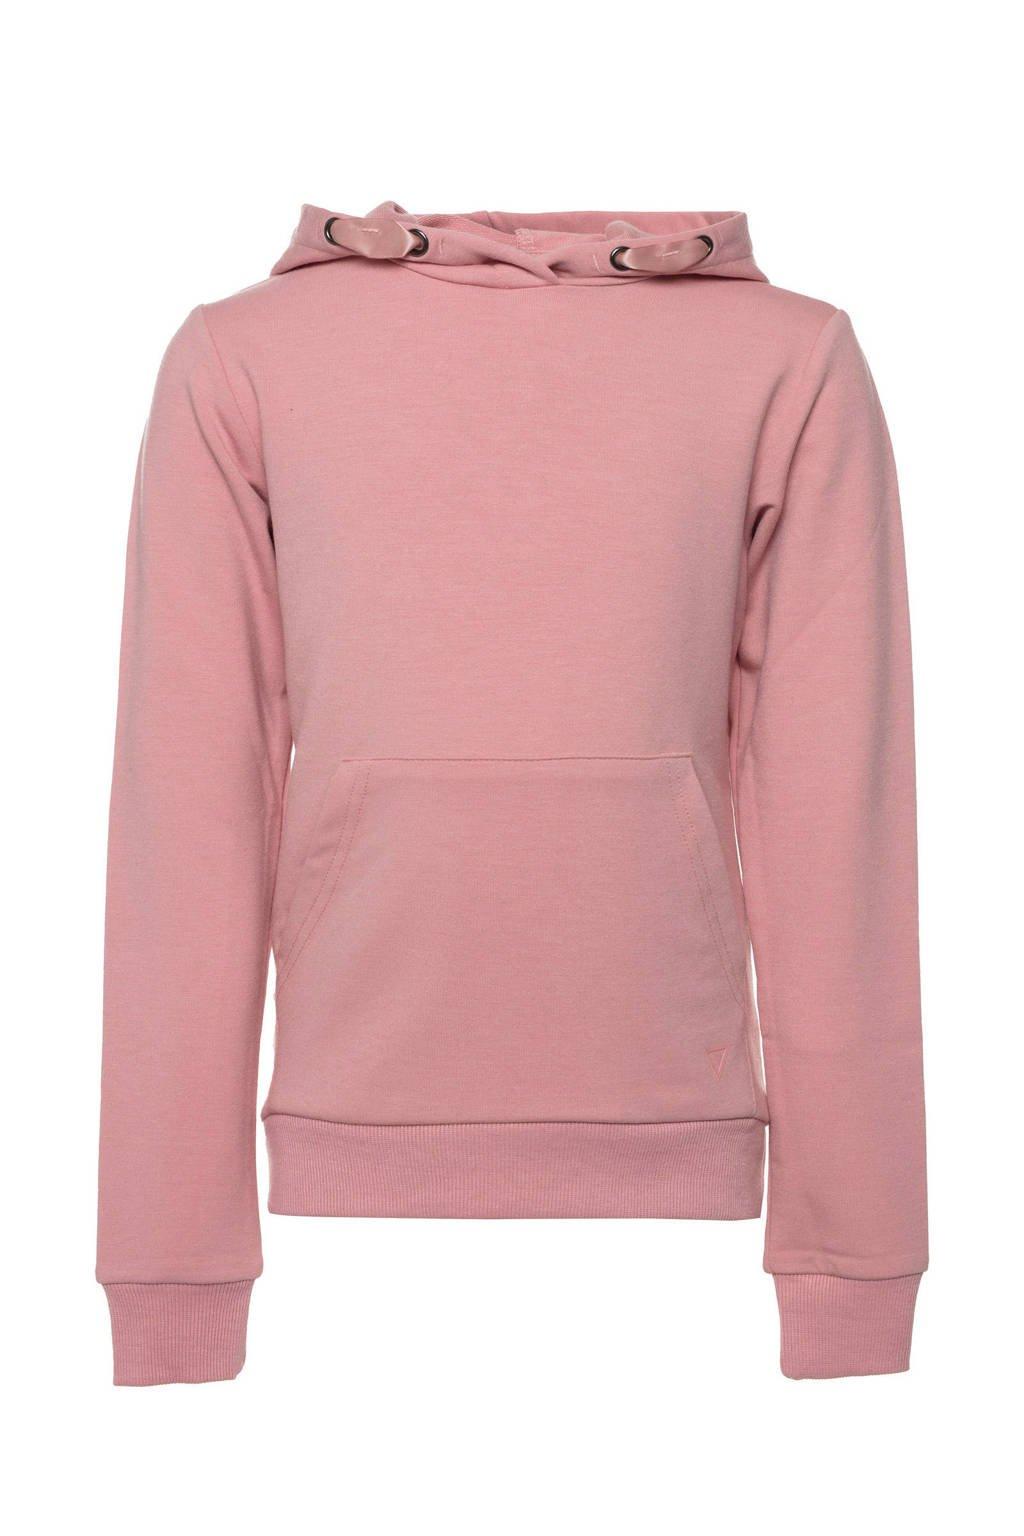 Scapino Osaga sportsweater roze, Roze